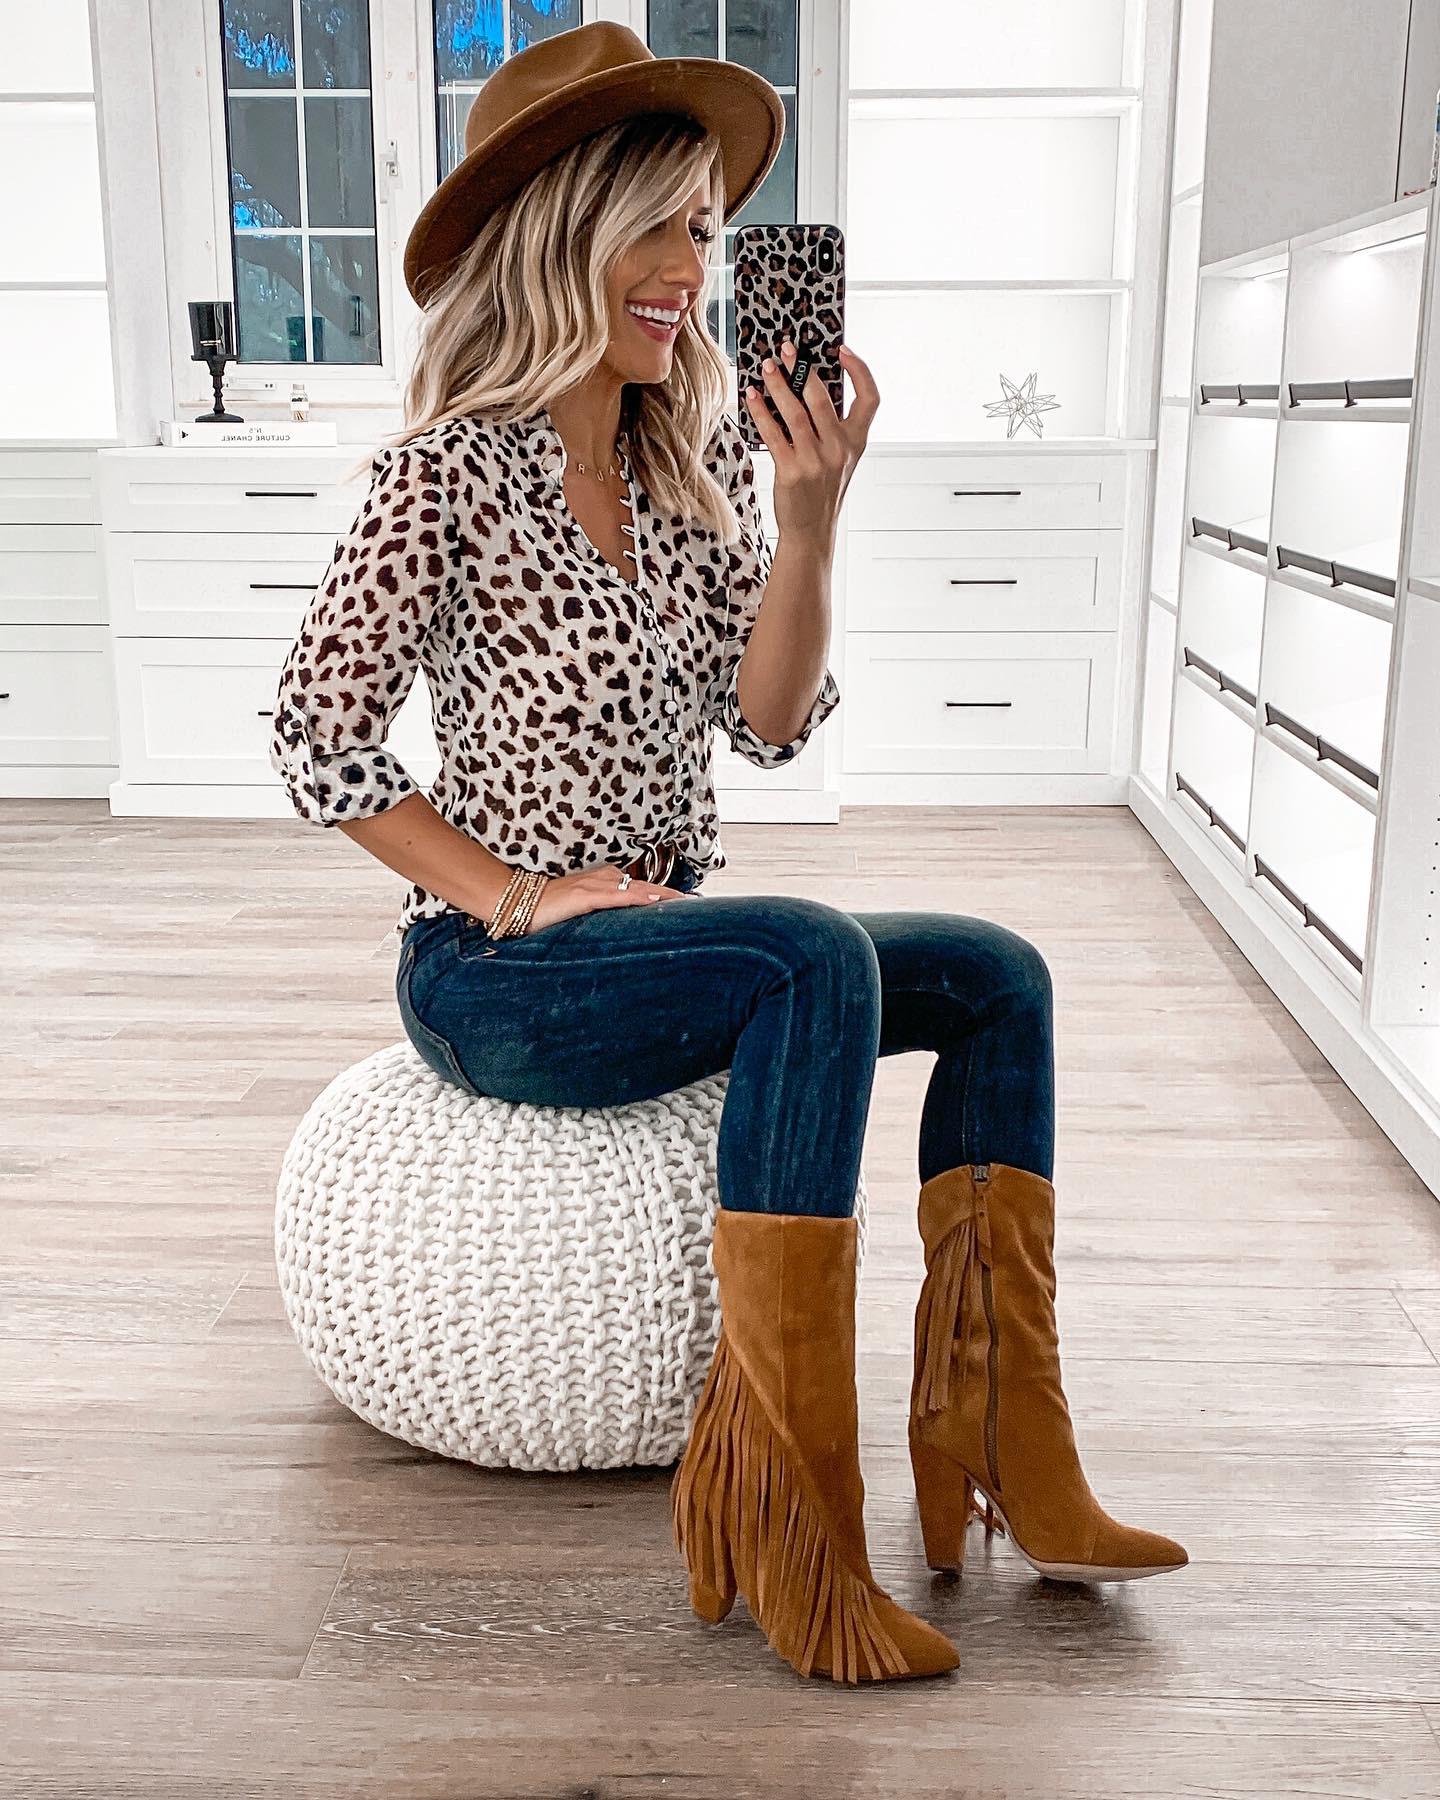 leopard work blouse express dark wash skinny jeans fringe booties laura beverlin